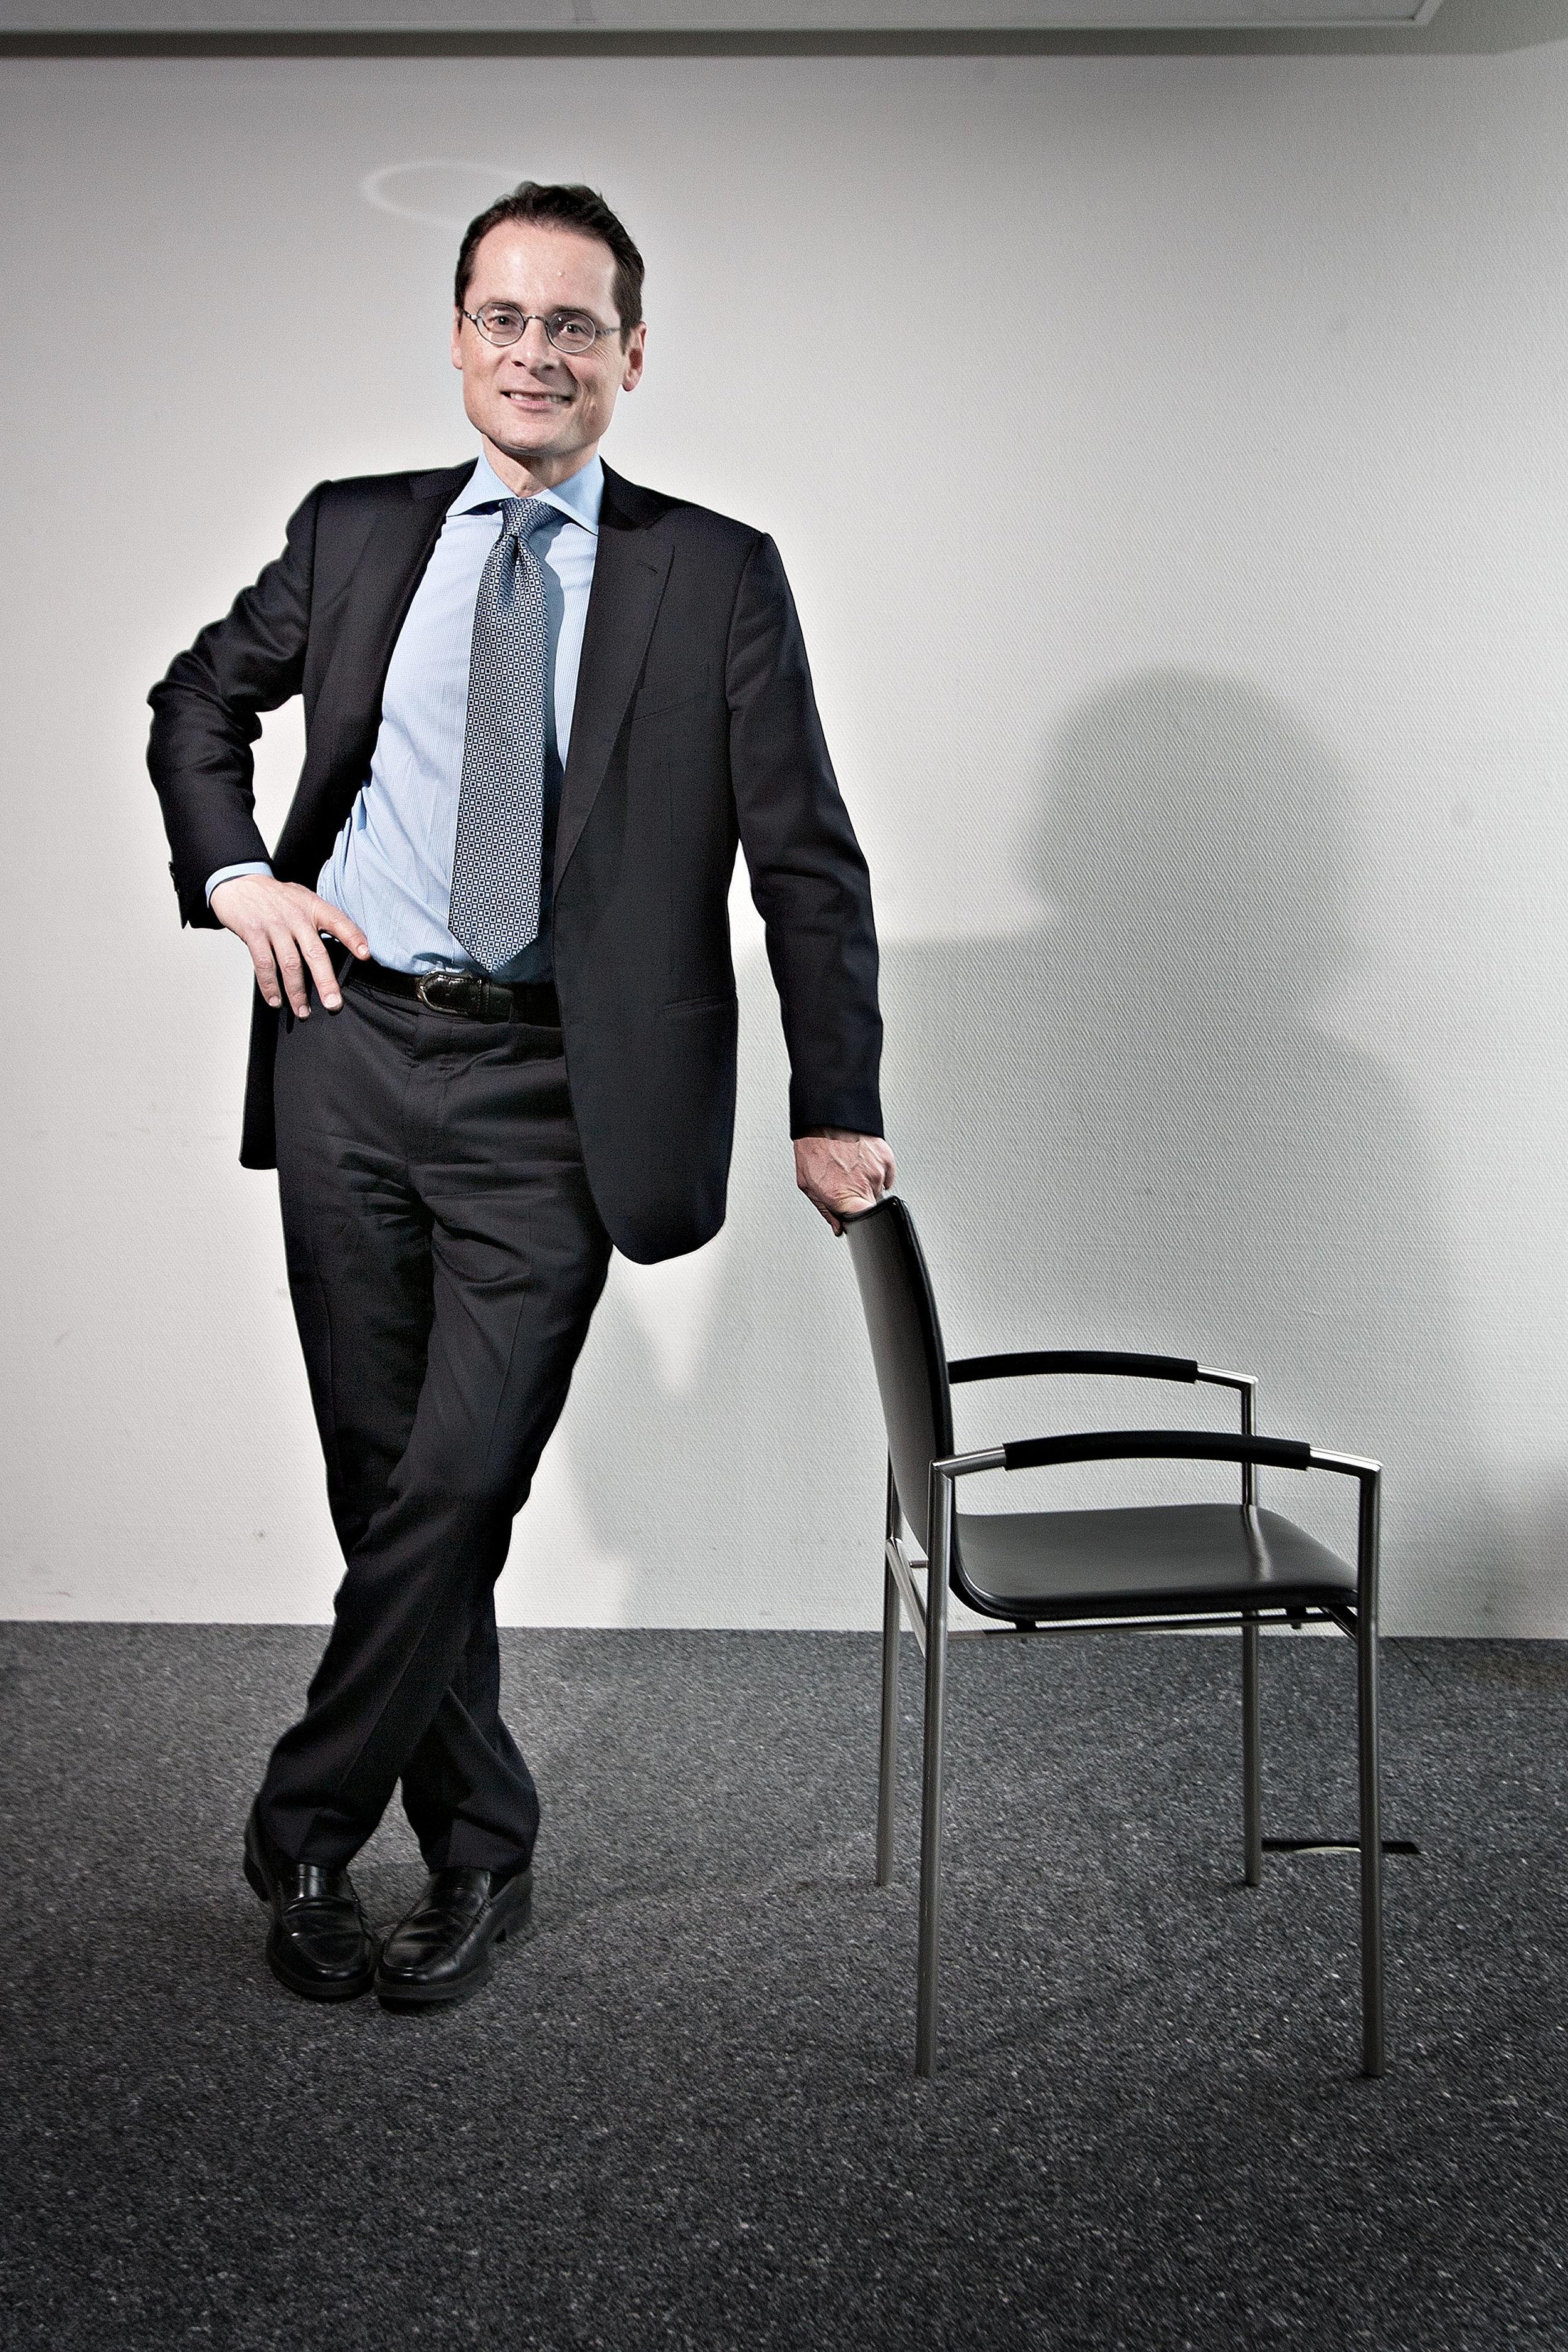 Roger Köppel, Verleger/Politiker - 24heures - 2013